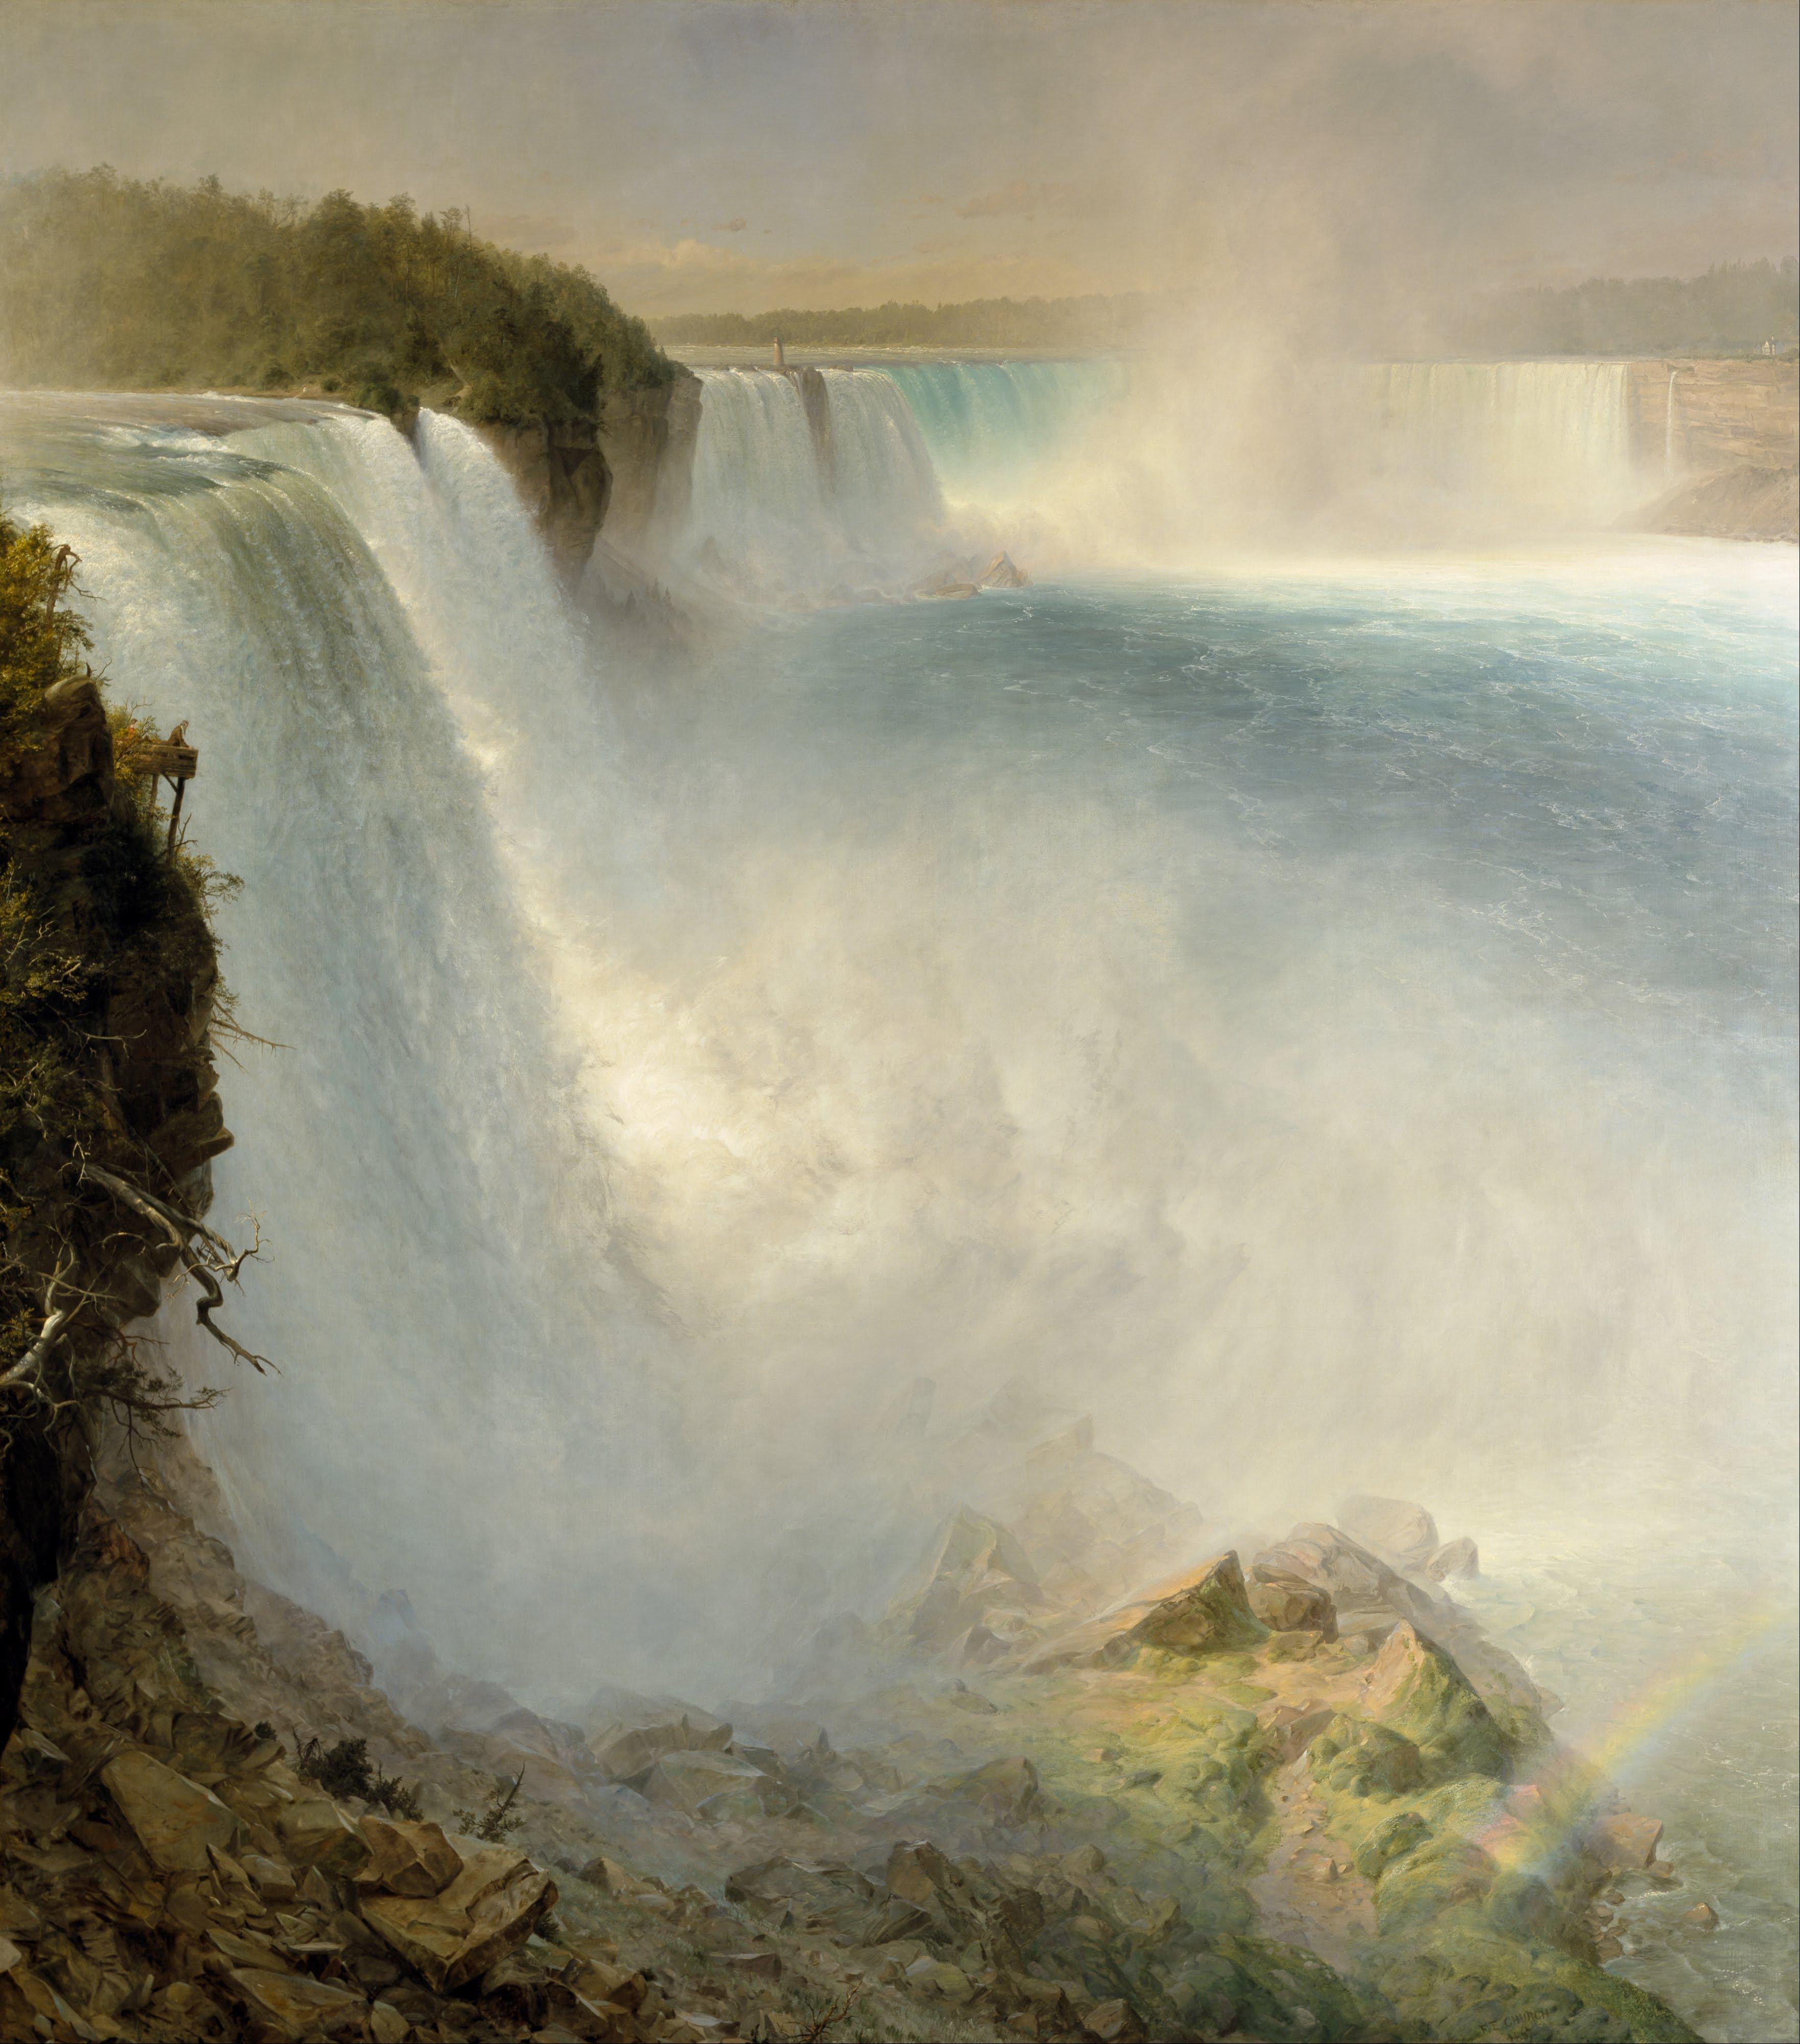 Niagara Falls, from the American Side, 1867, Frederic Edwin Church (American, 1826-1900)